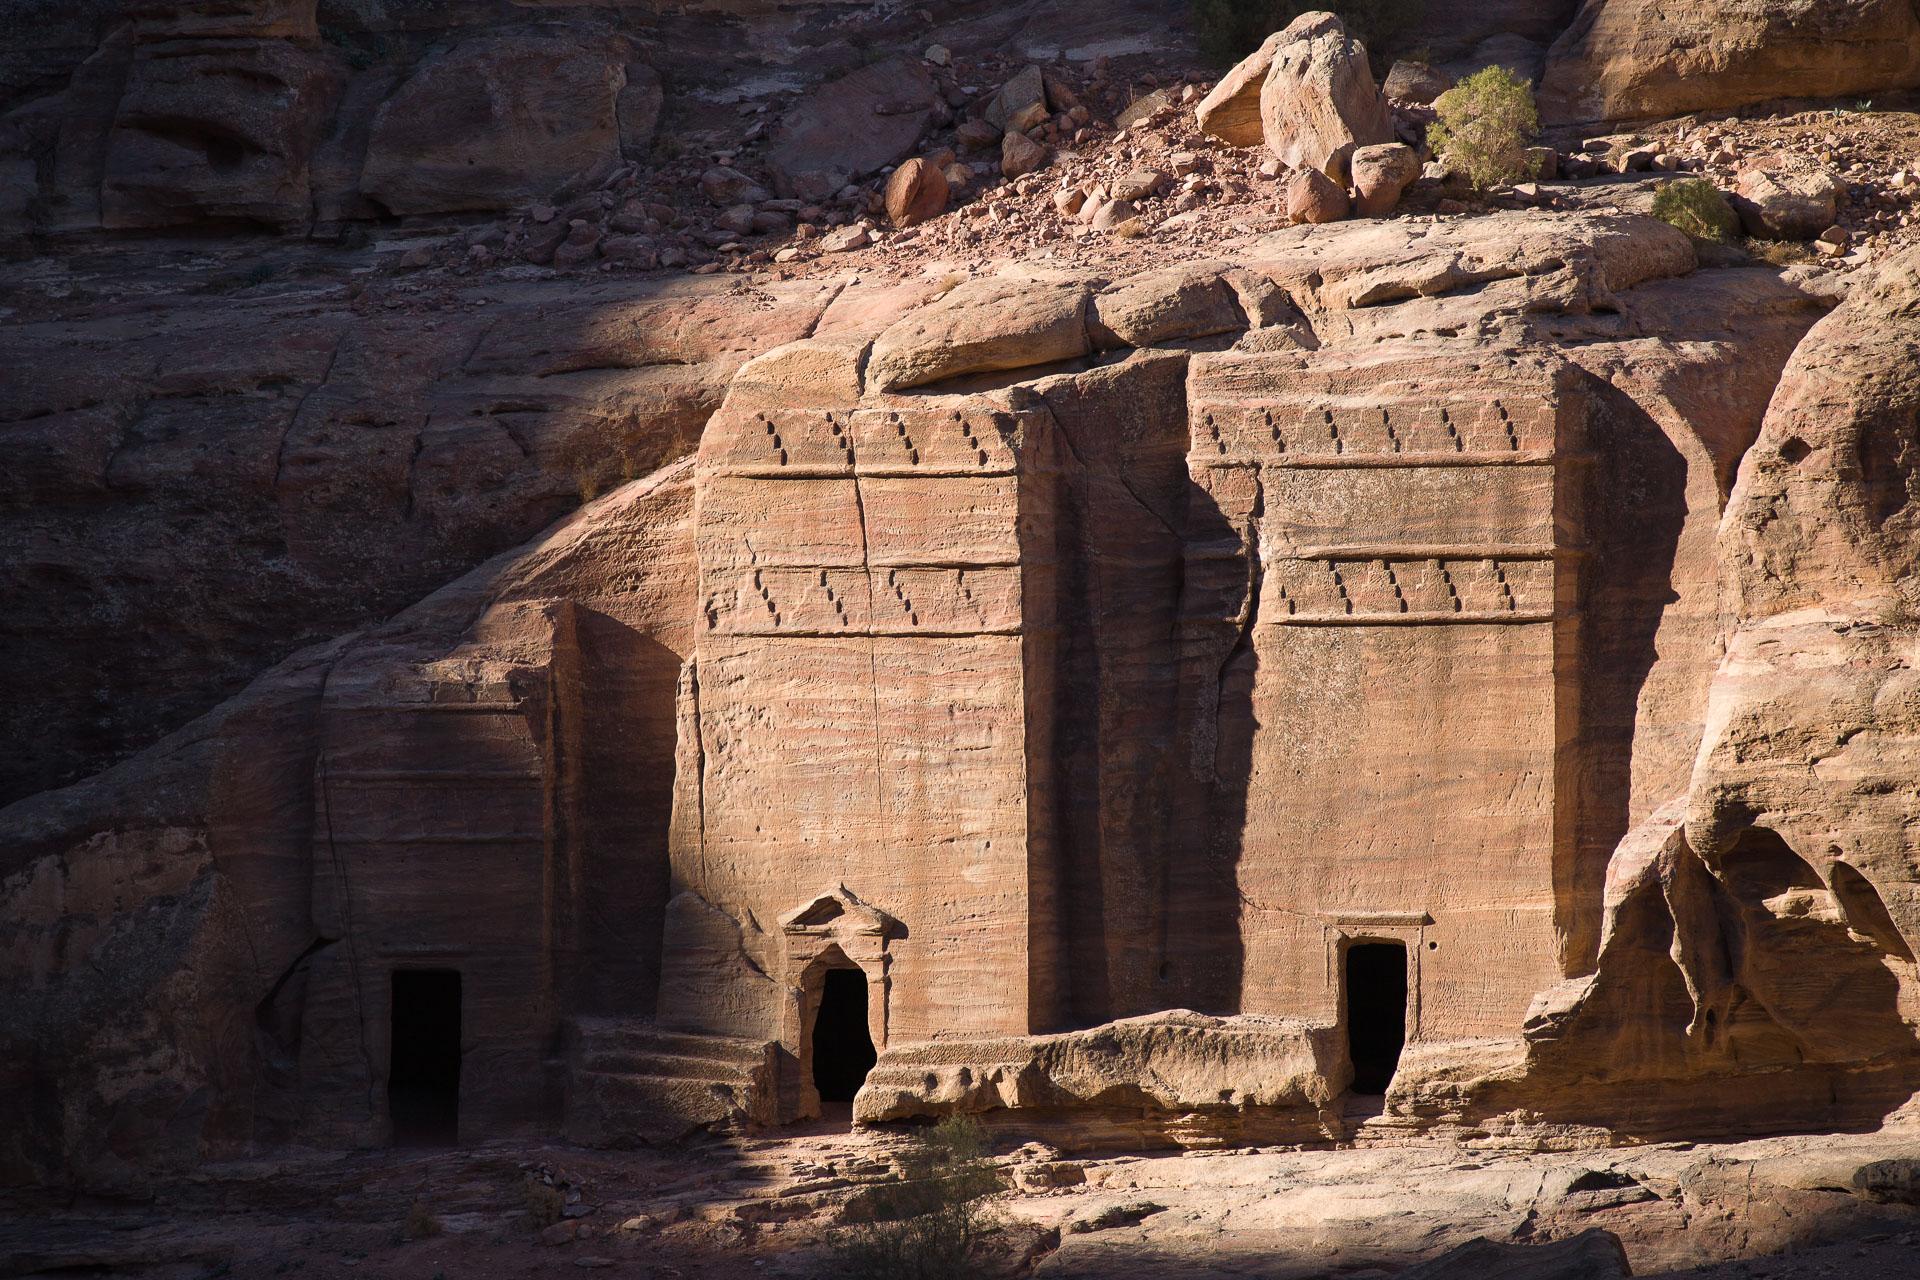 Tombeau nabatéens de style assyrien à Petra en Jordanie